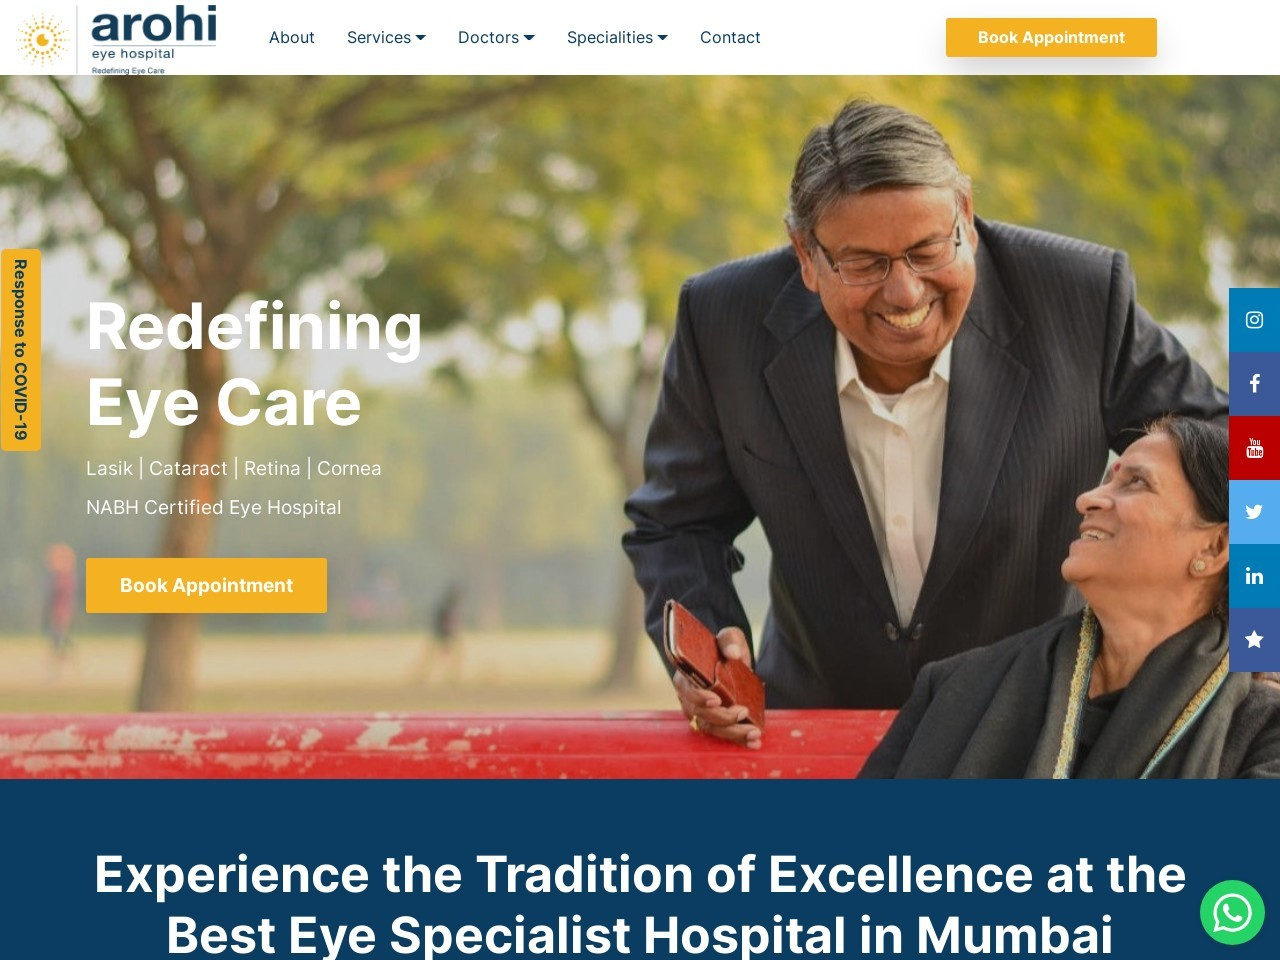 Best Eye Hospital in Mumbai – Best Eye Surgeons in Mumbai. Arohi Eye Hospital